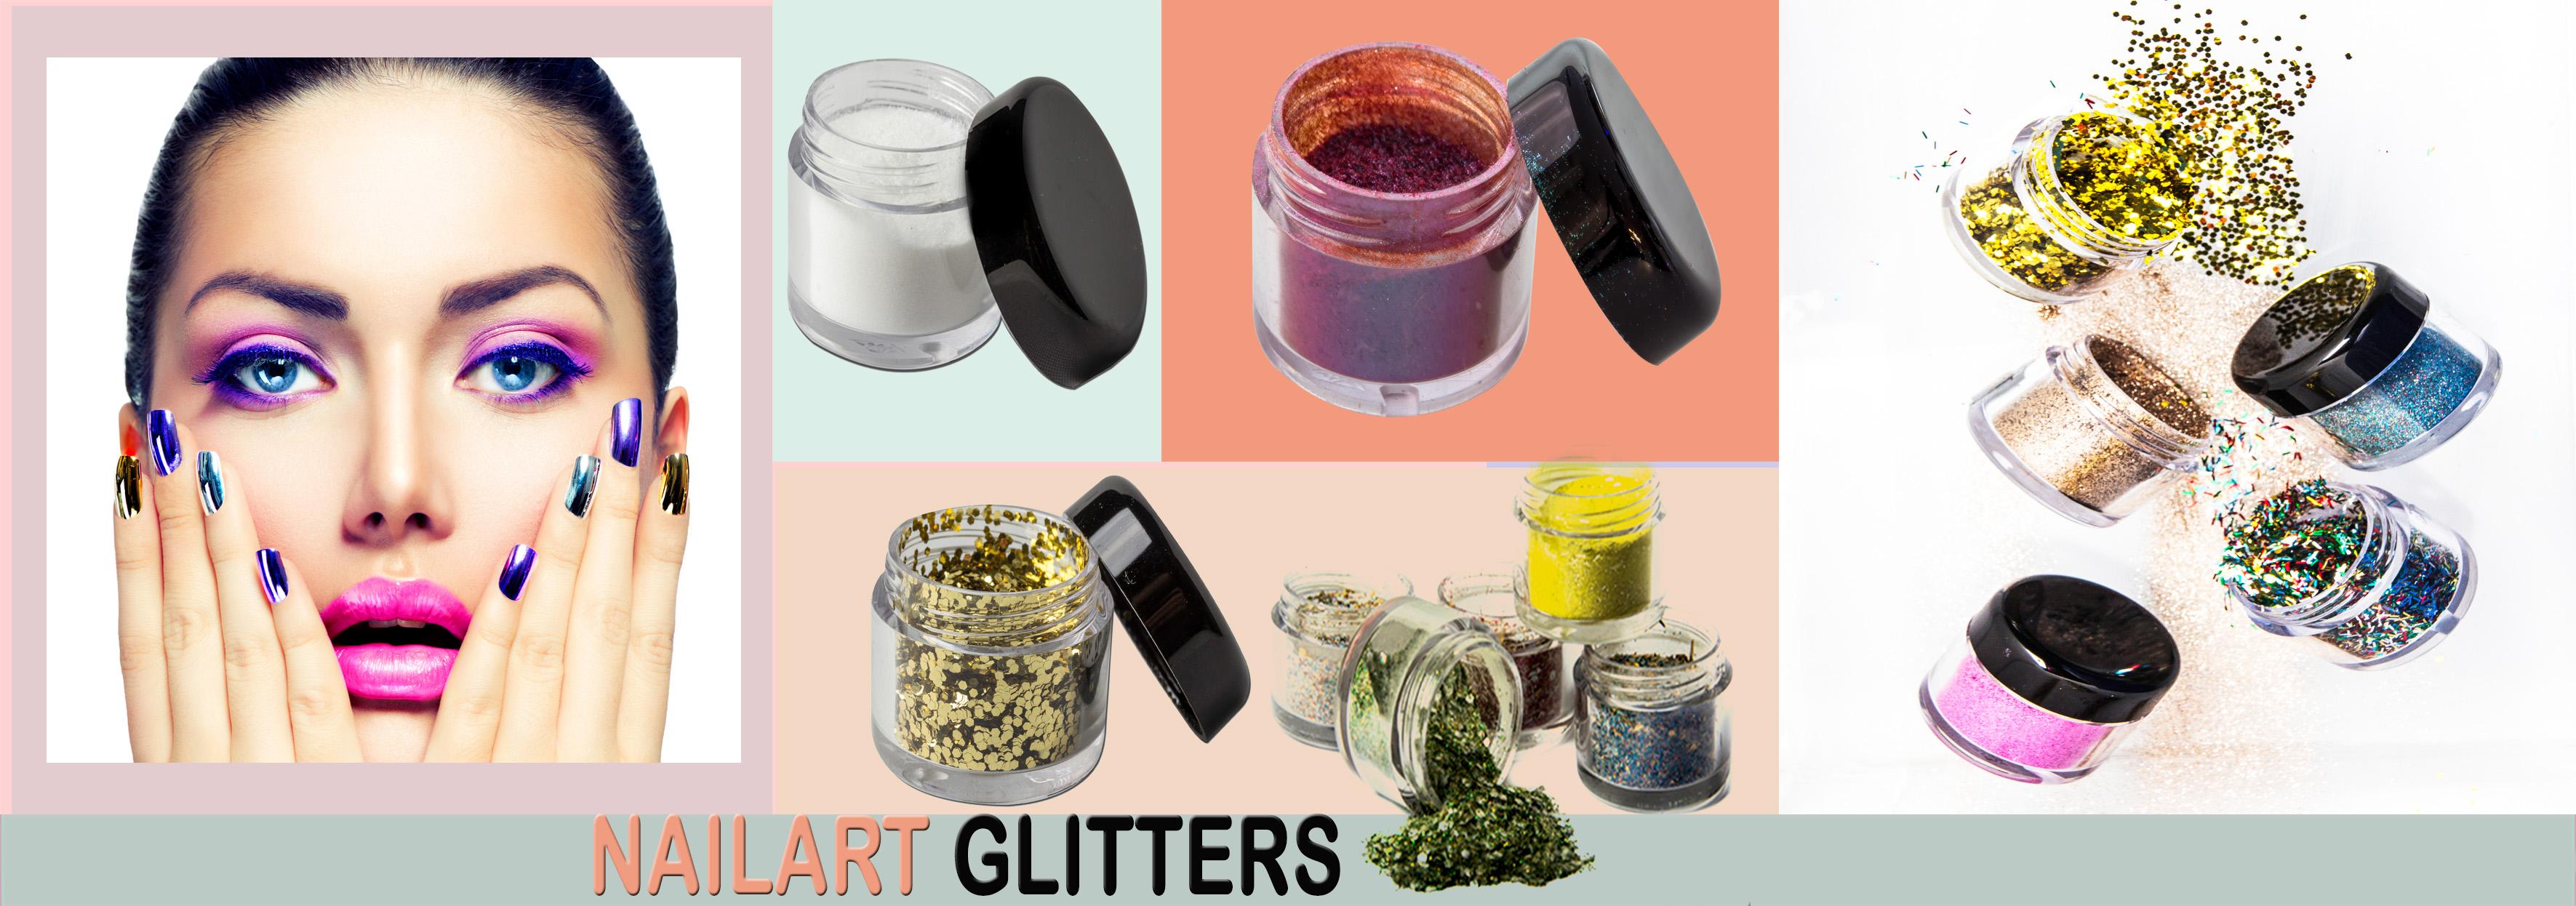 Nailart glitters